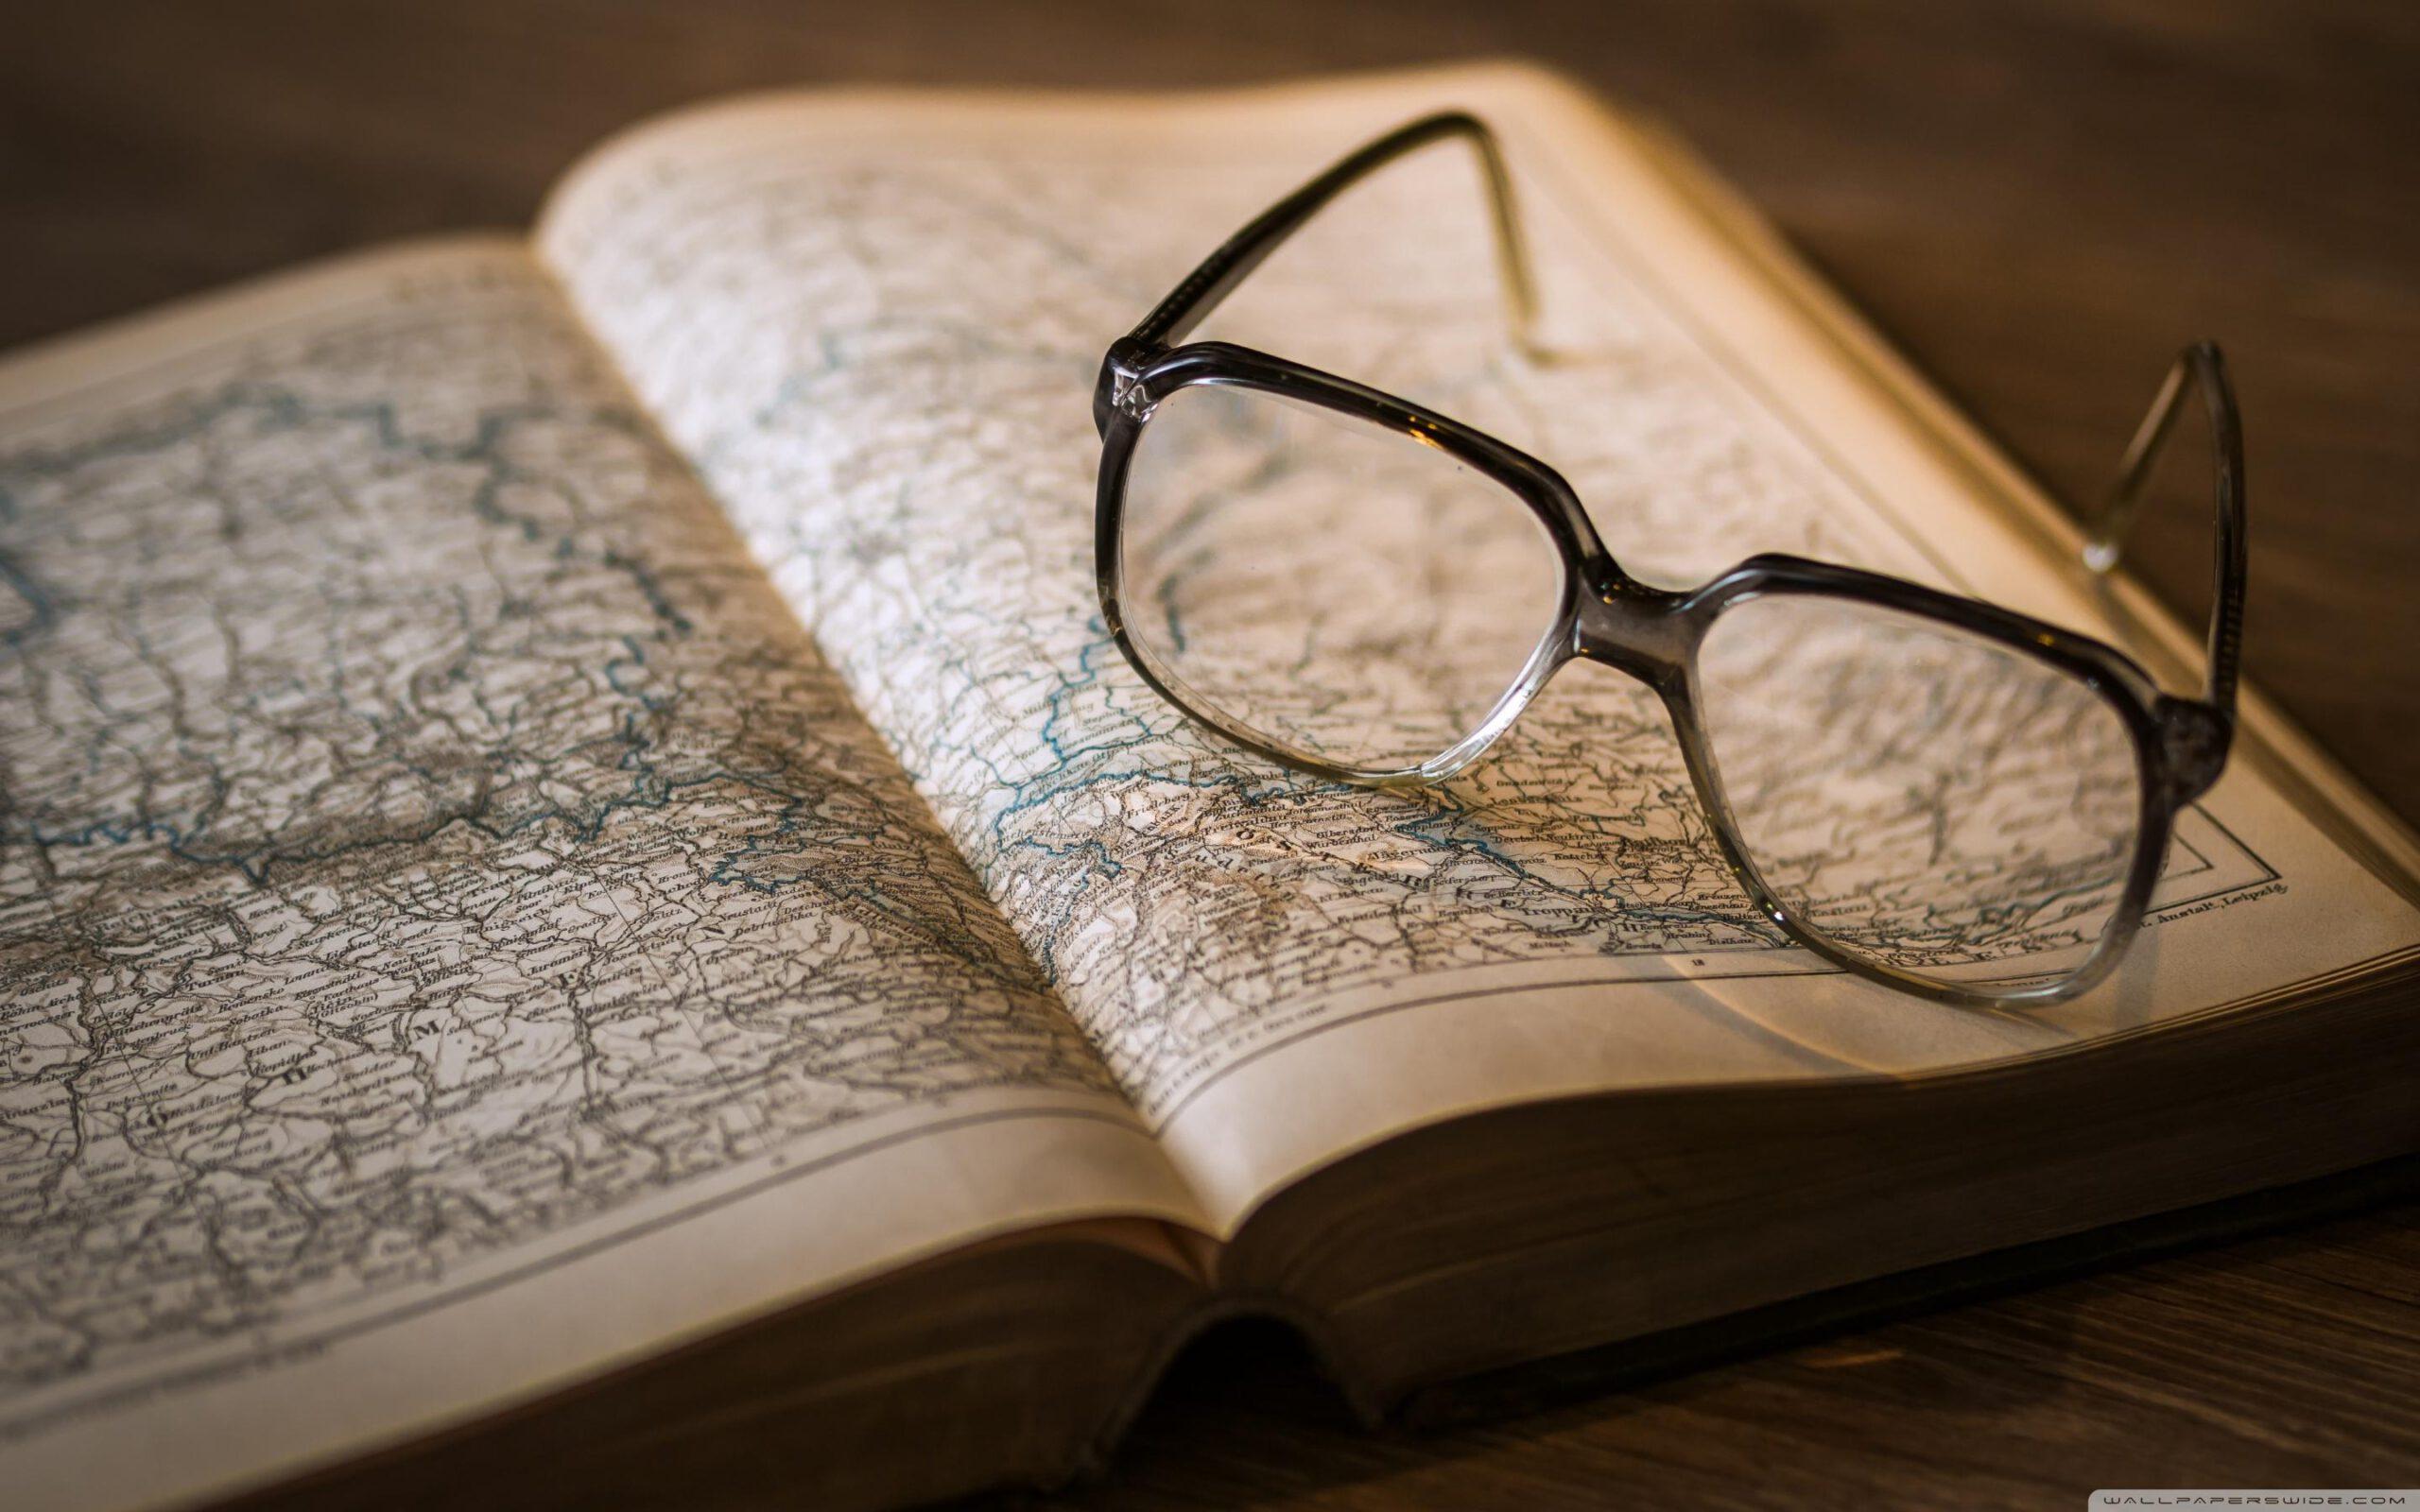 اکسپت و چاپ مقاله علمی پژوهشی | نگارش، اکسپت و چاپ مقاله ISI